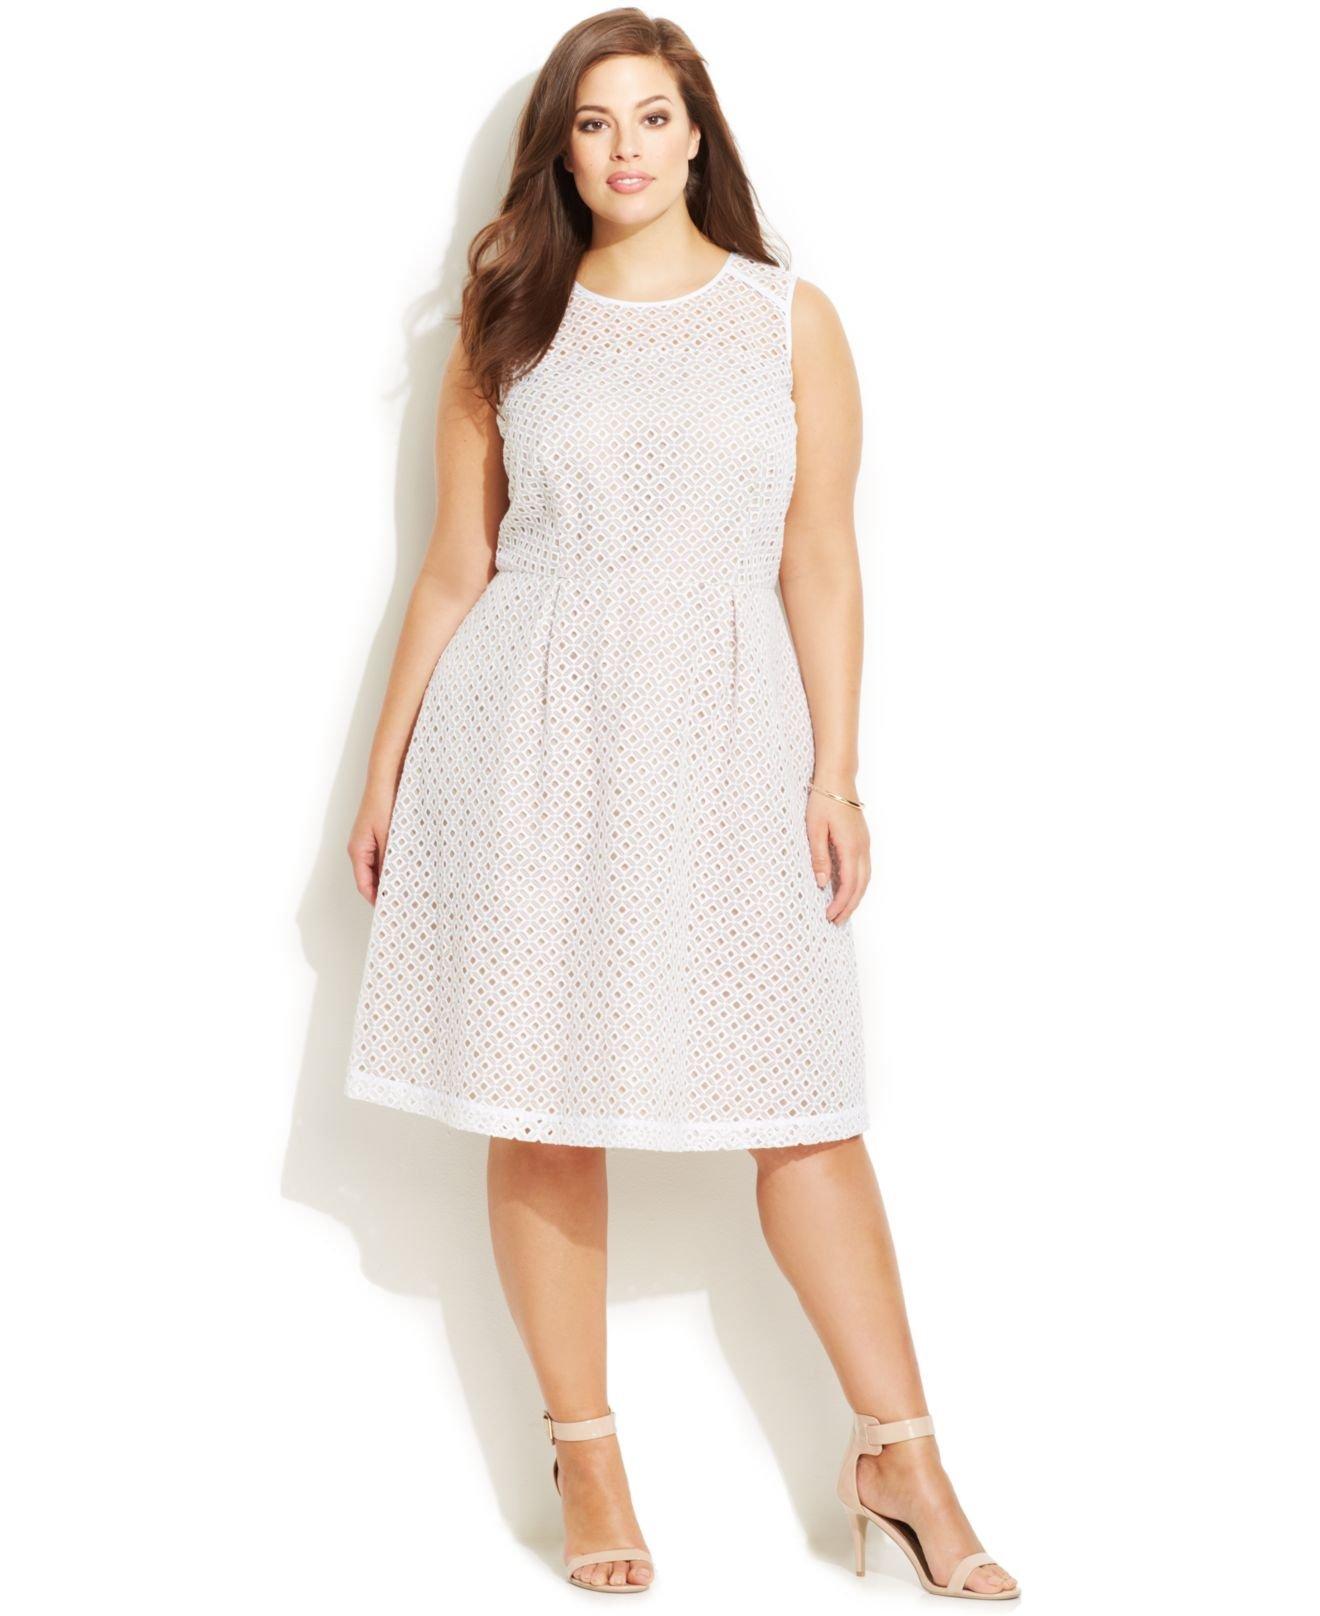 macys wedding guest dresses Adrianna Papell Cap Sleeve Scalloped Lace Sheath Dresses Women Macy s